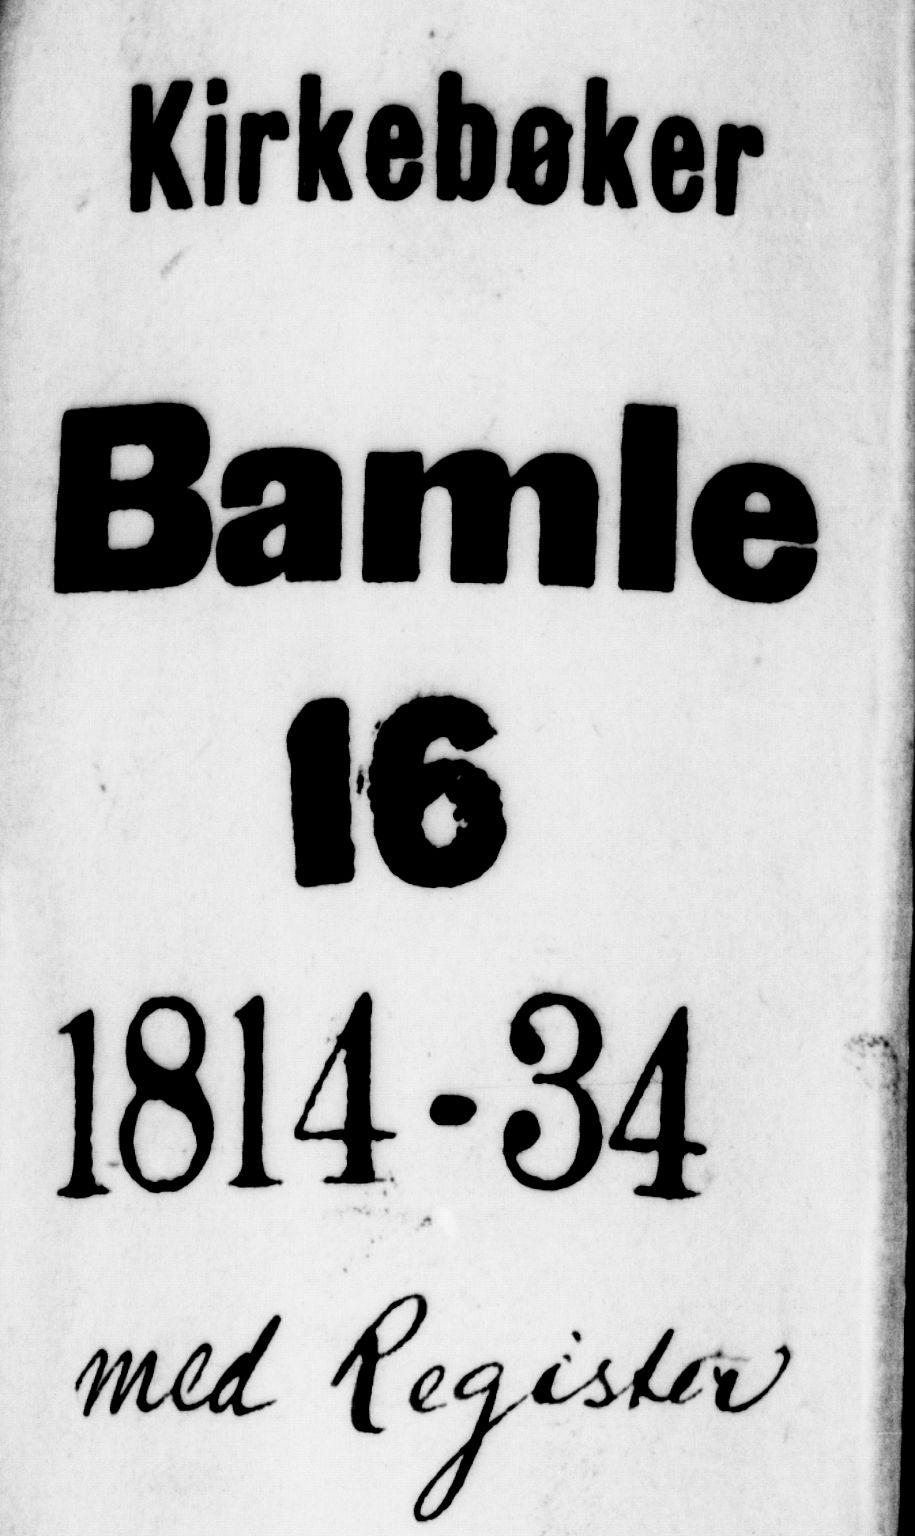 SAKO, Bamble kirkebøker, F/Fa/L0003: Ministerialbok nr. I 3 /1, 1814-1834